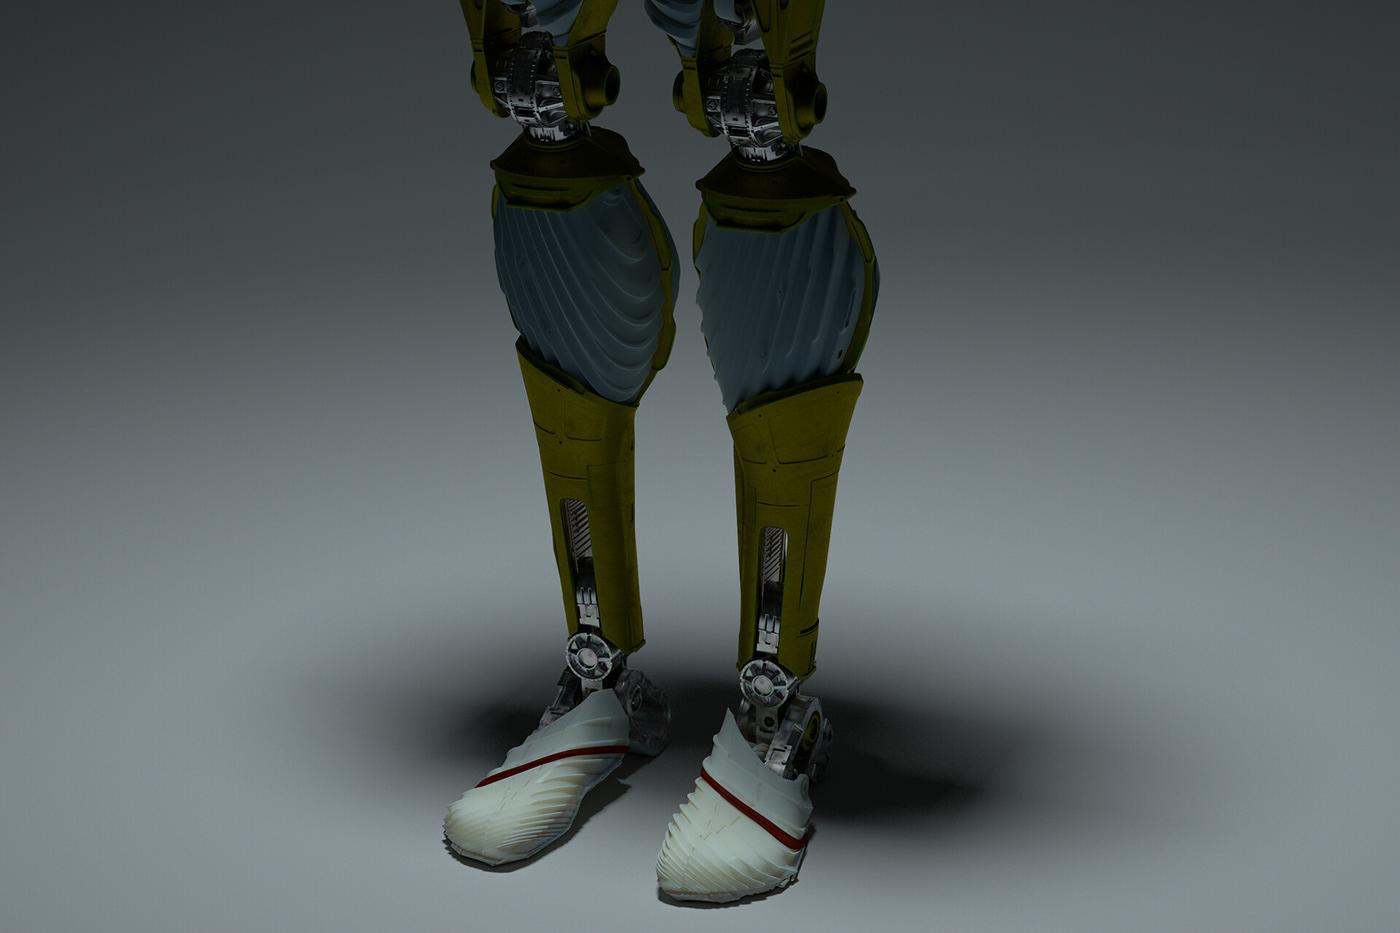 Image may contain: footwear and cartoon